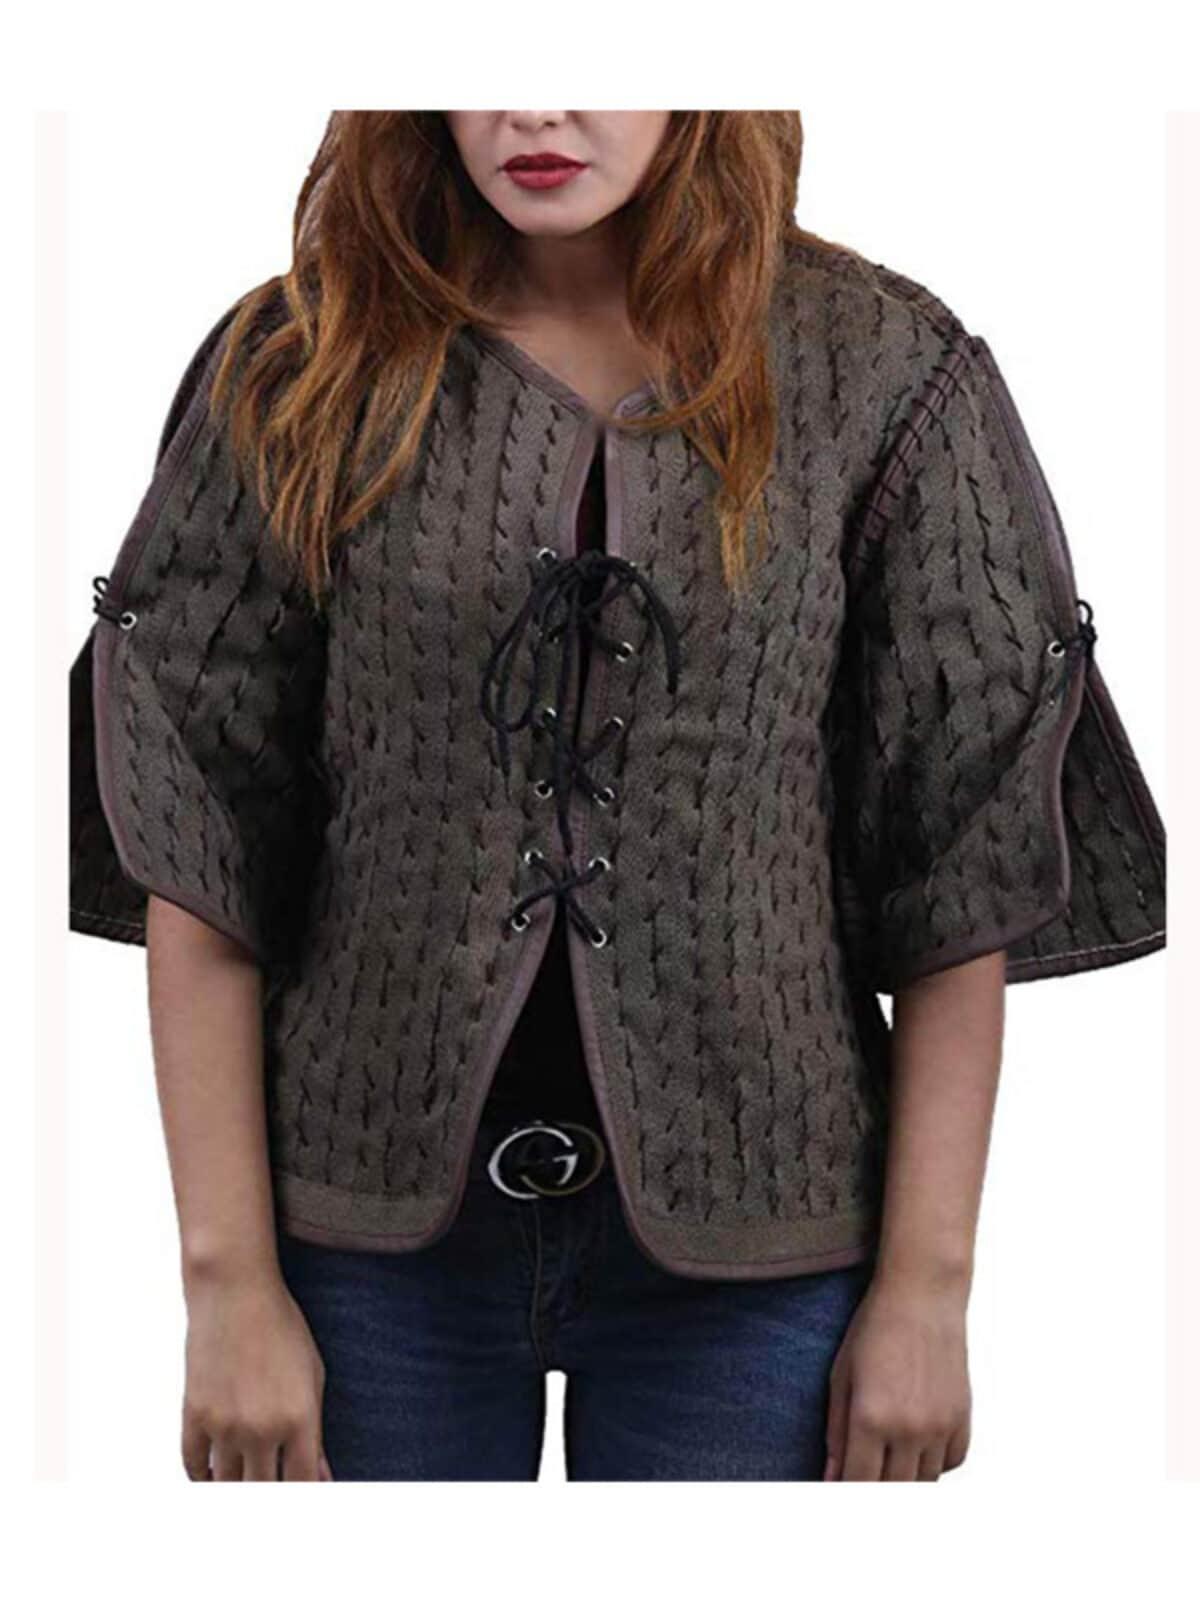 Maisie Williams Game Of Thrones Jacket